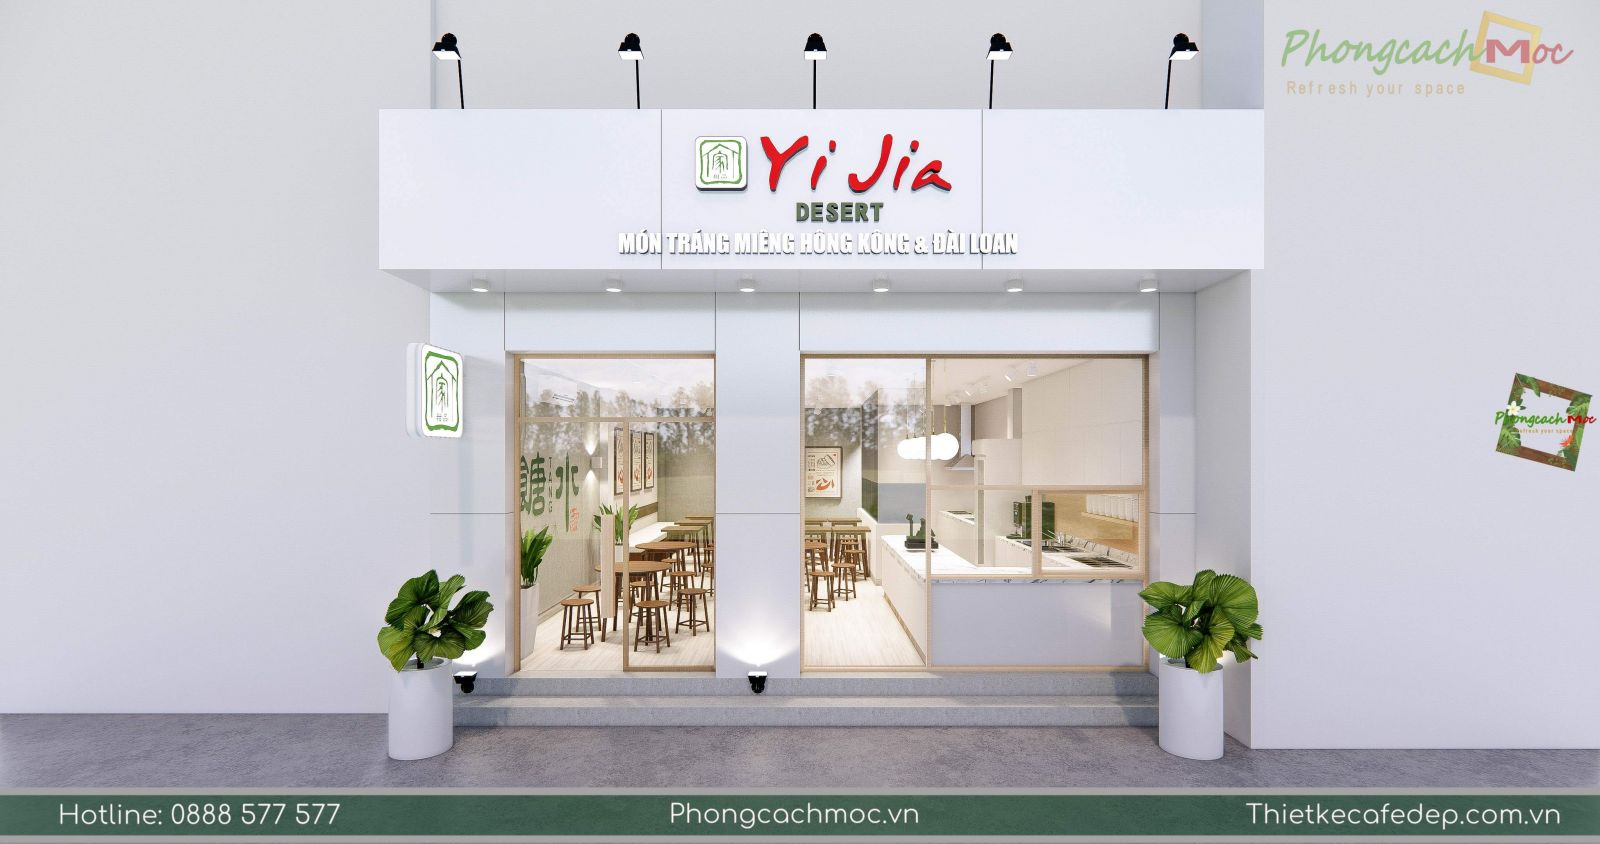 Yi-Jia-Dessert-Vinh-Vien-quan10-2